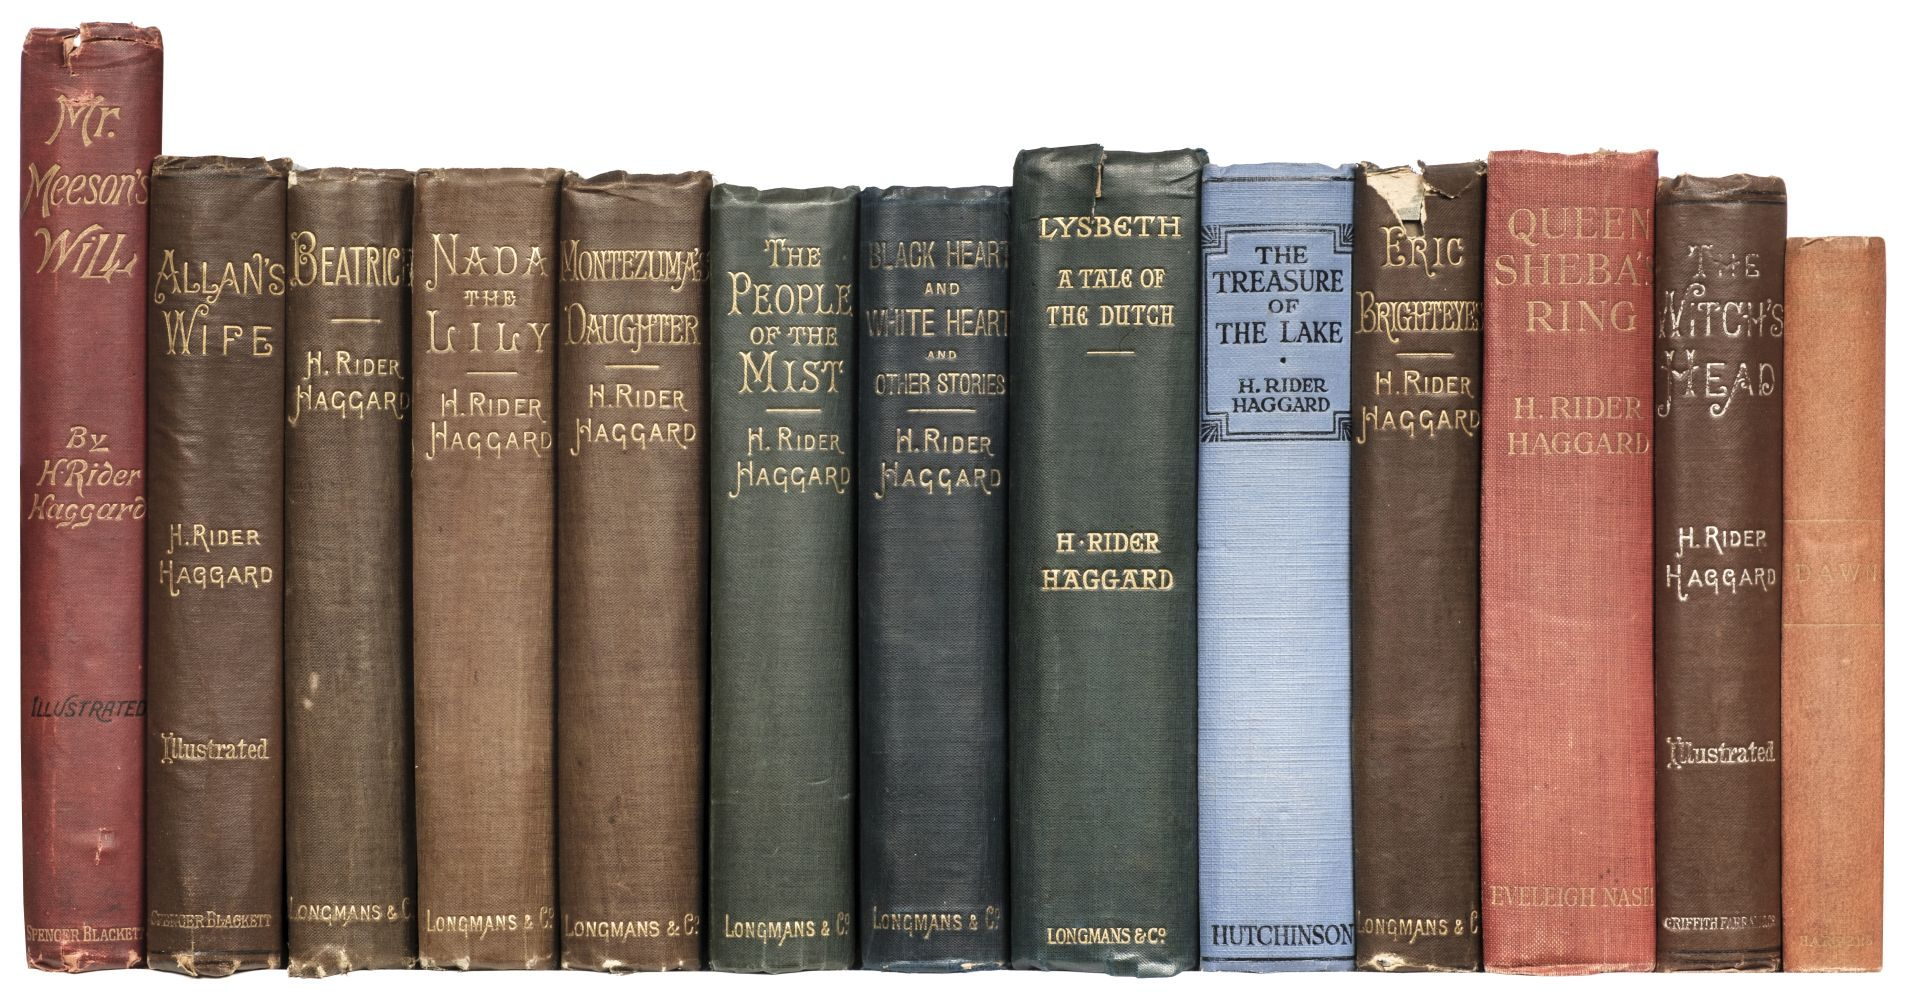 Haggard (Henry Rider). Dawn, 1st US edition, 1887